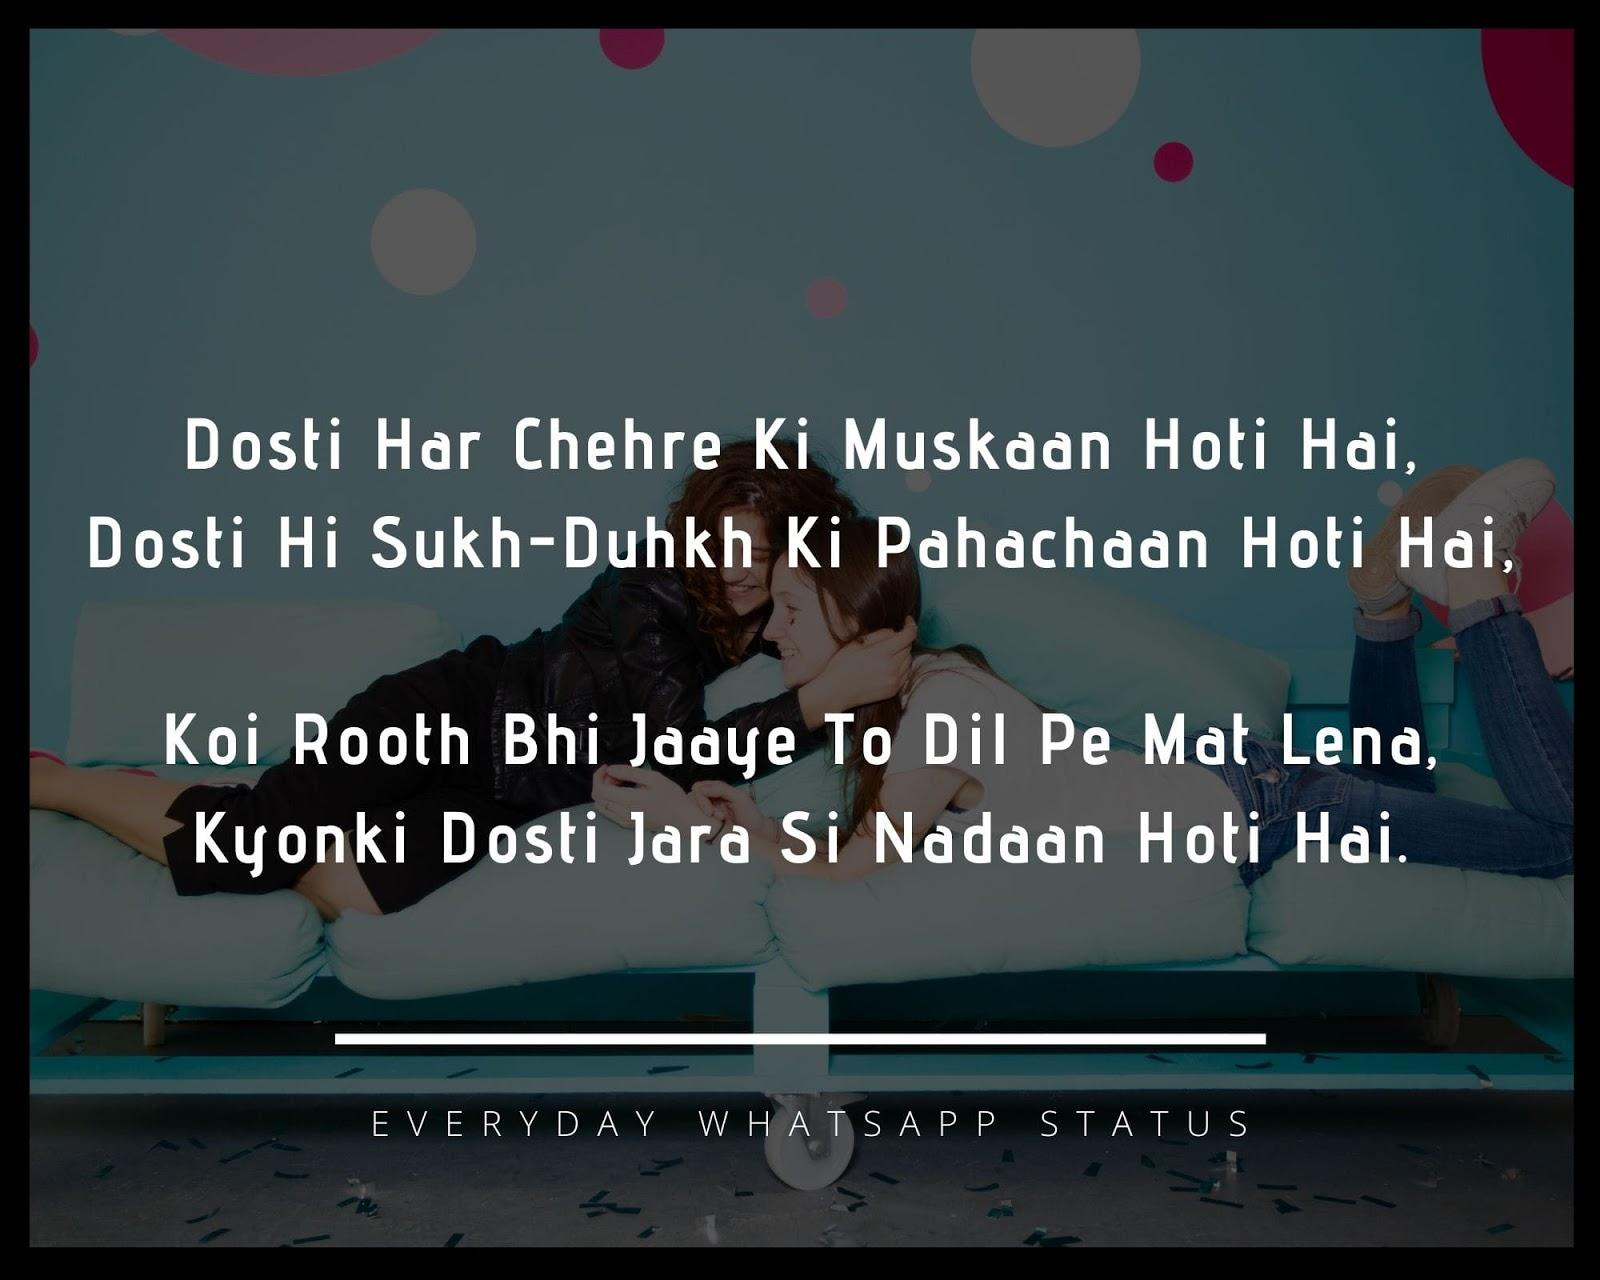 Dosti Shayari Image - Dosti Har Chehre Ki Muskaan Hoti Hai